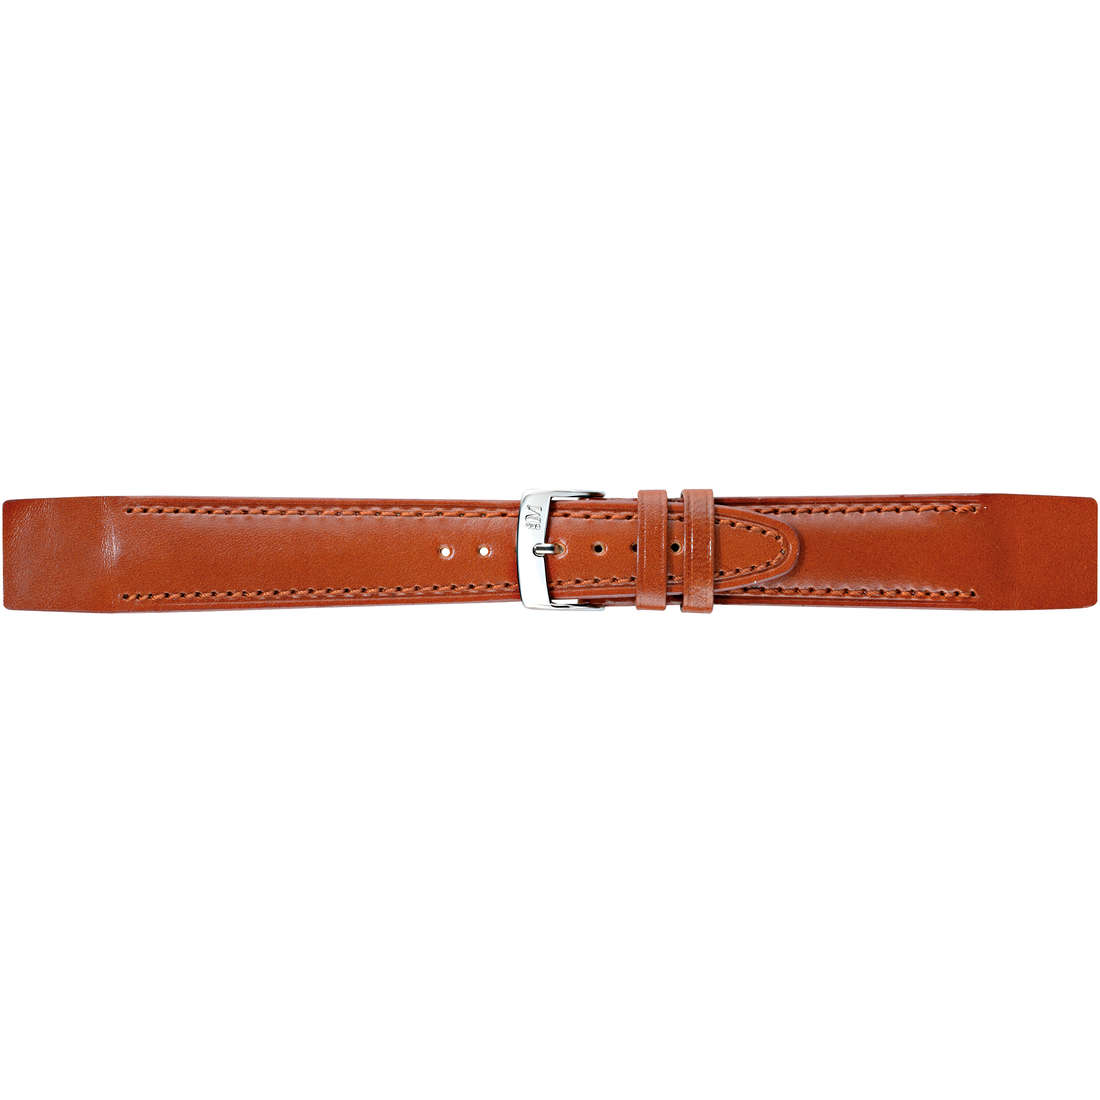 montre bande de montres homme Morellato I Lunghi A01U2663403041CR20